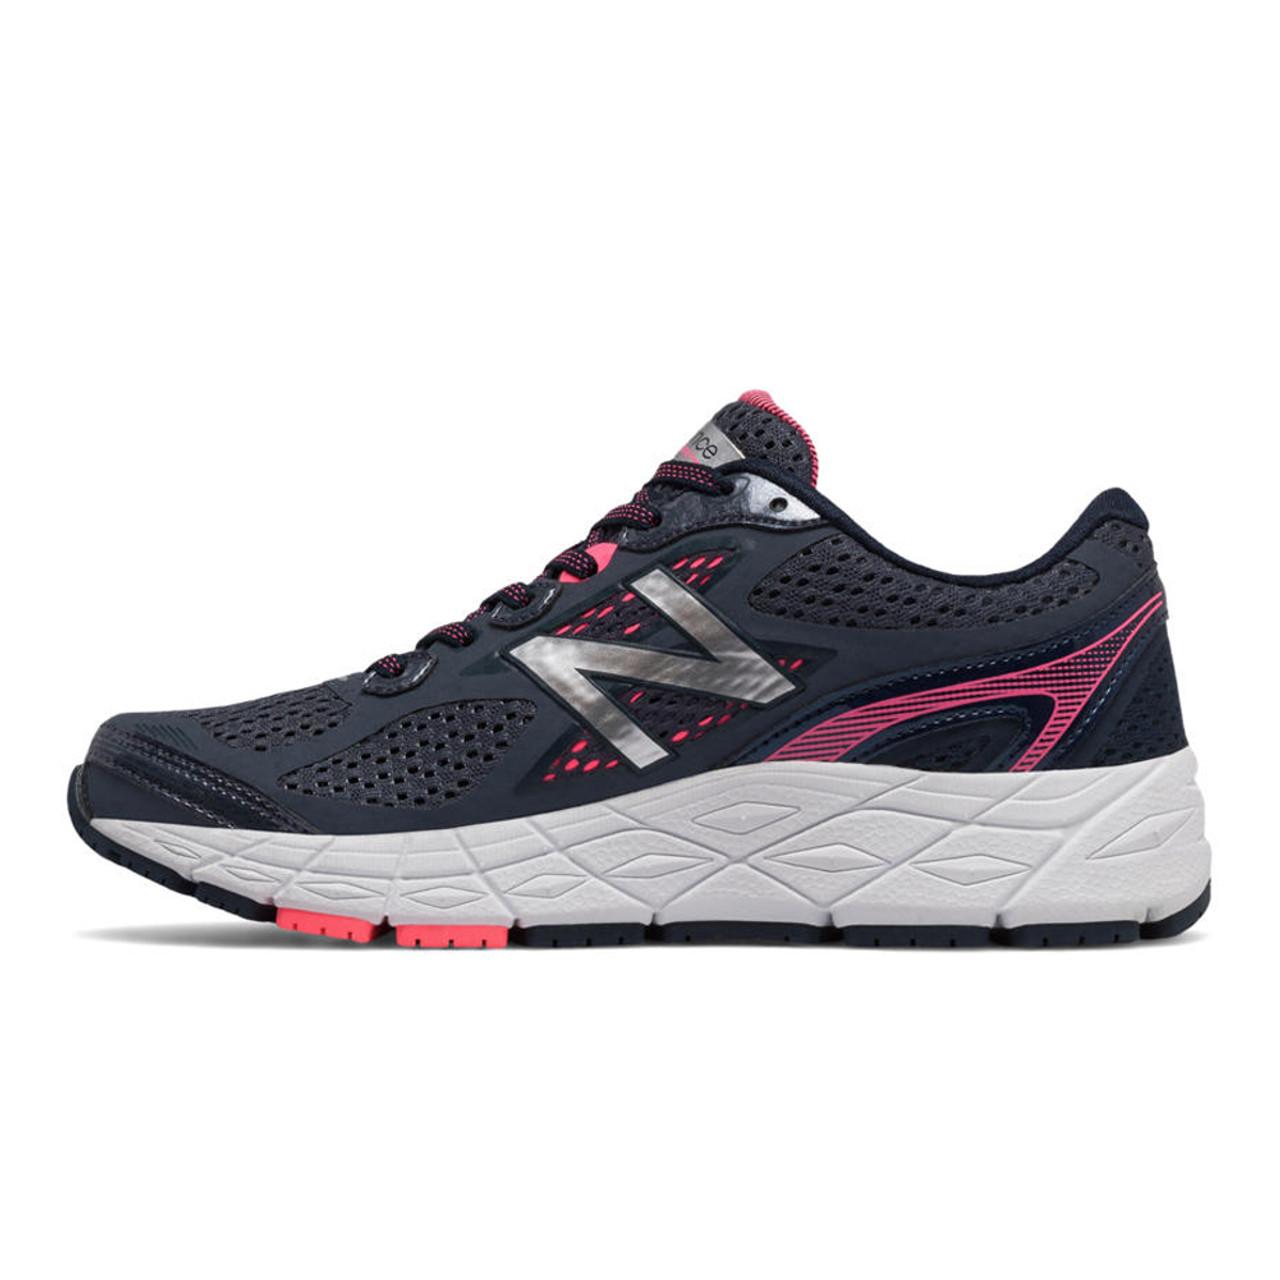 New Balance Ladies Shoes